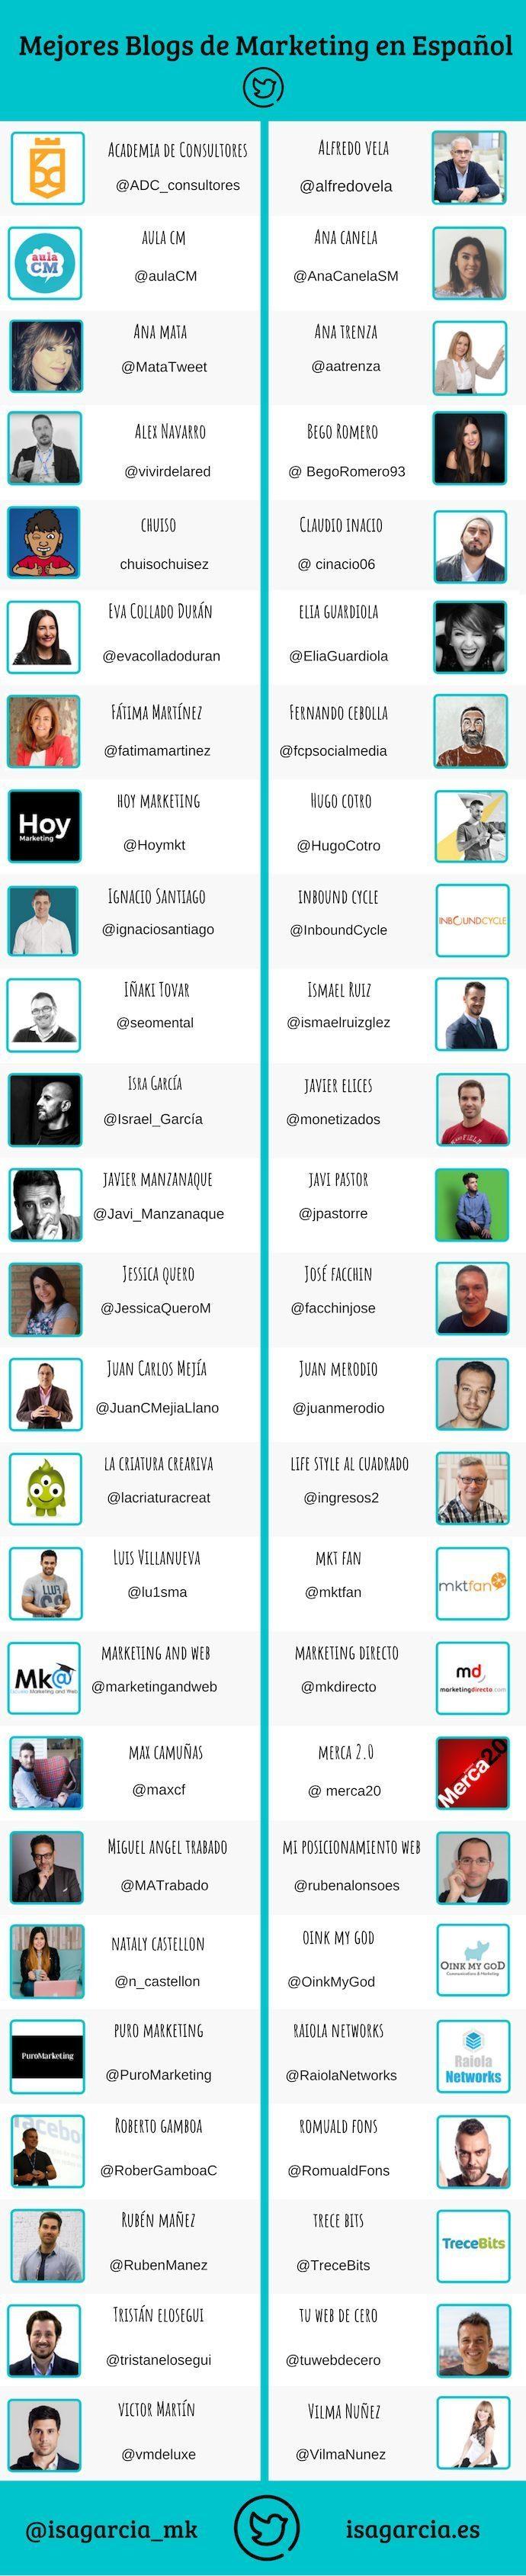 50 mejores blogs de Marketing Digital en español #infografia #infographic #marketing